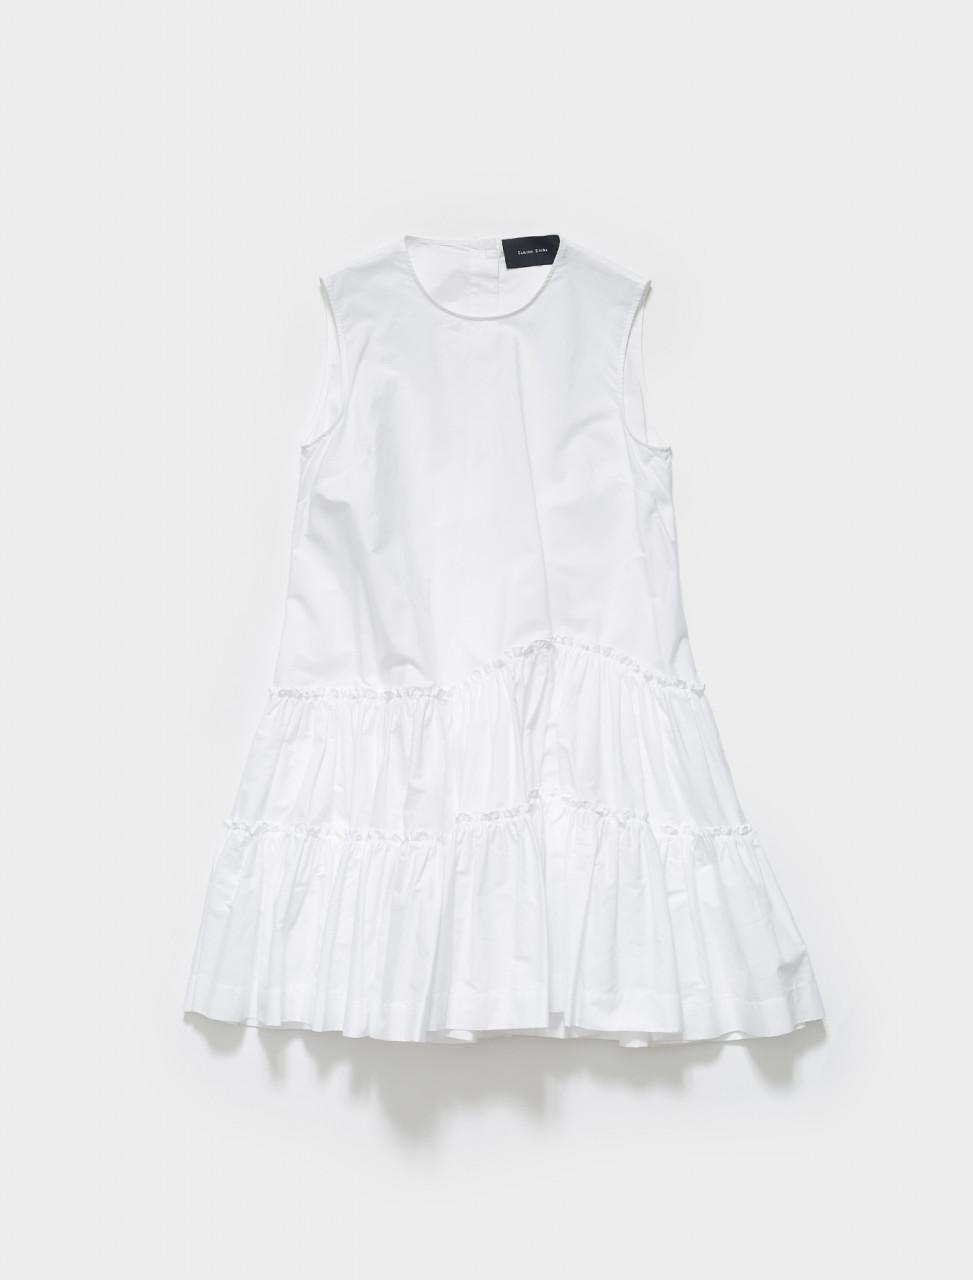 290-3727-0109 SIMONE ROCHA SLEEVELESS SHORT FRILL DRESS WHITE